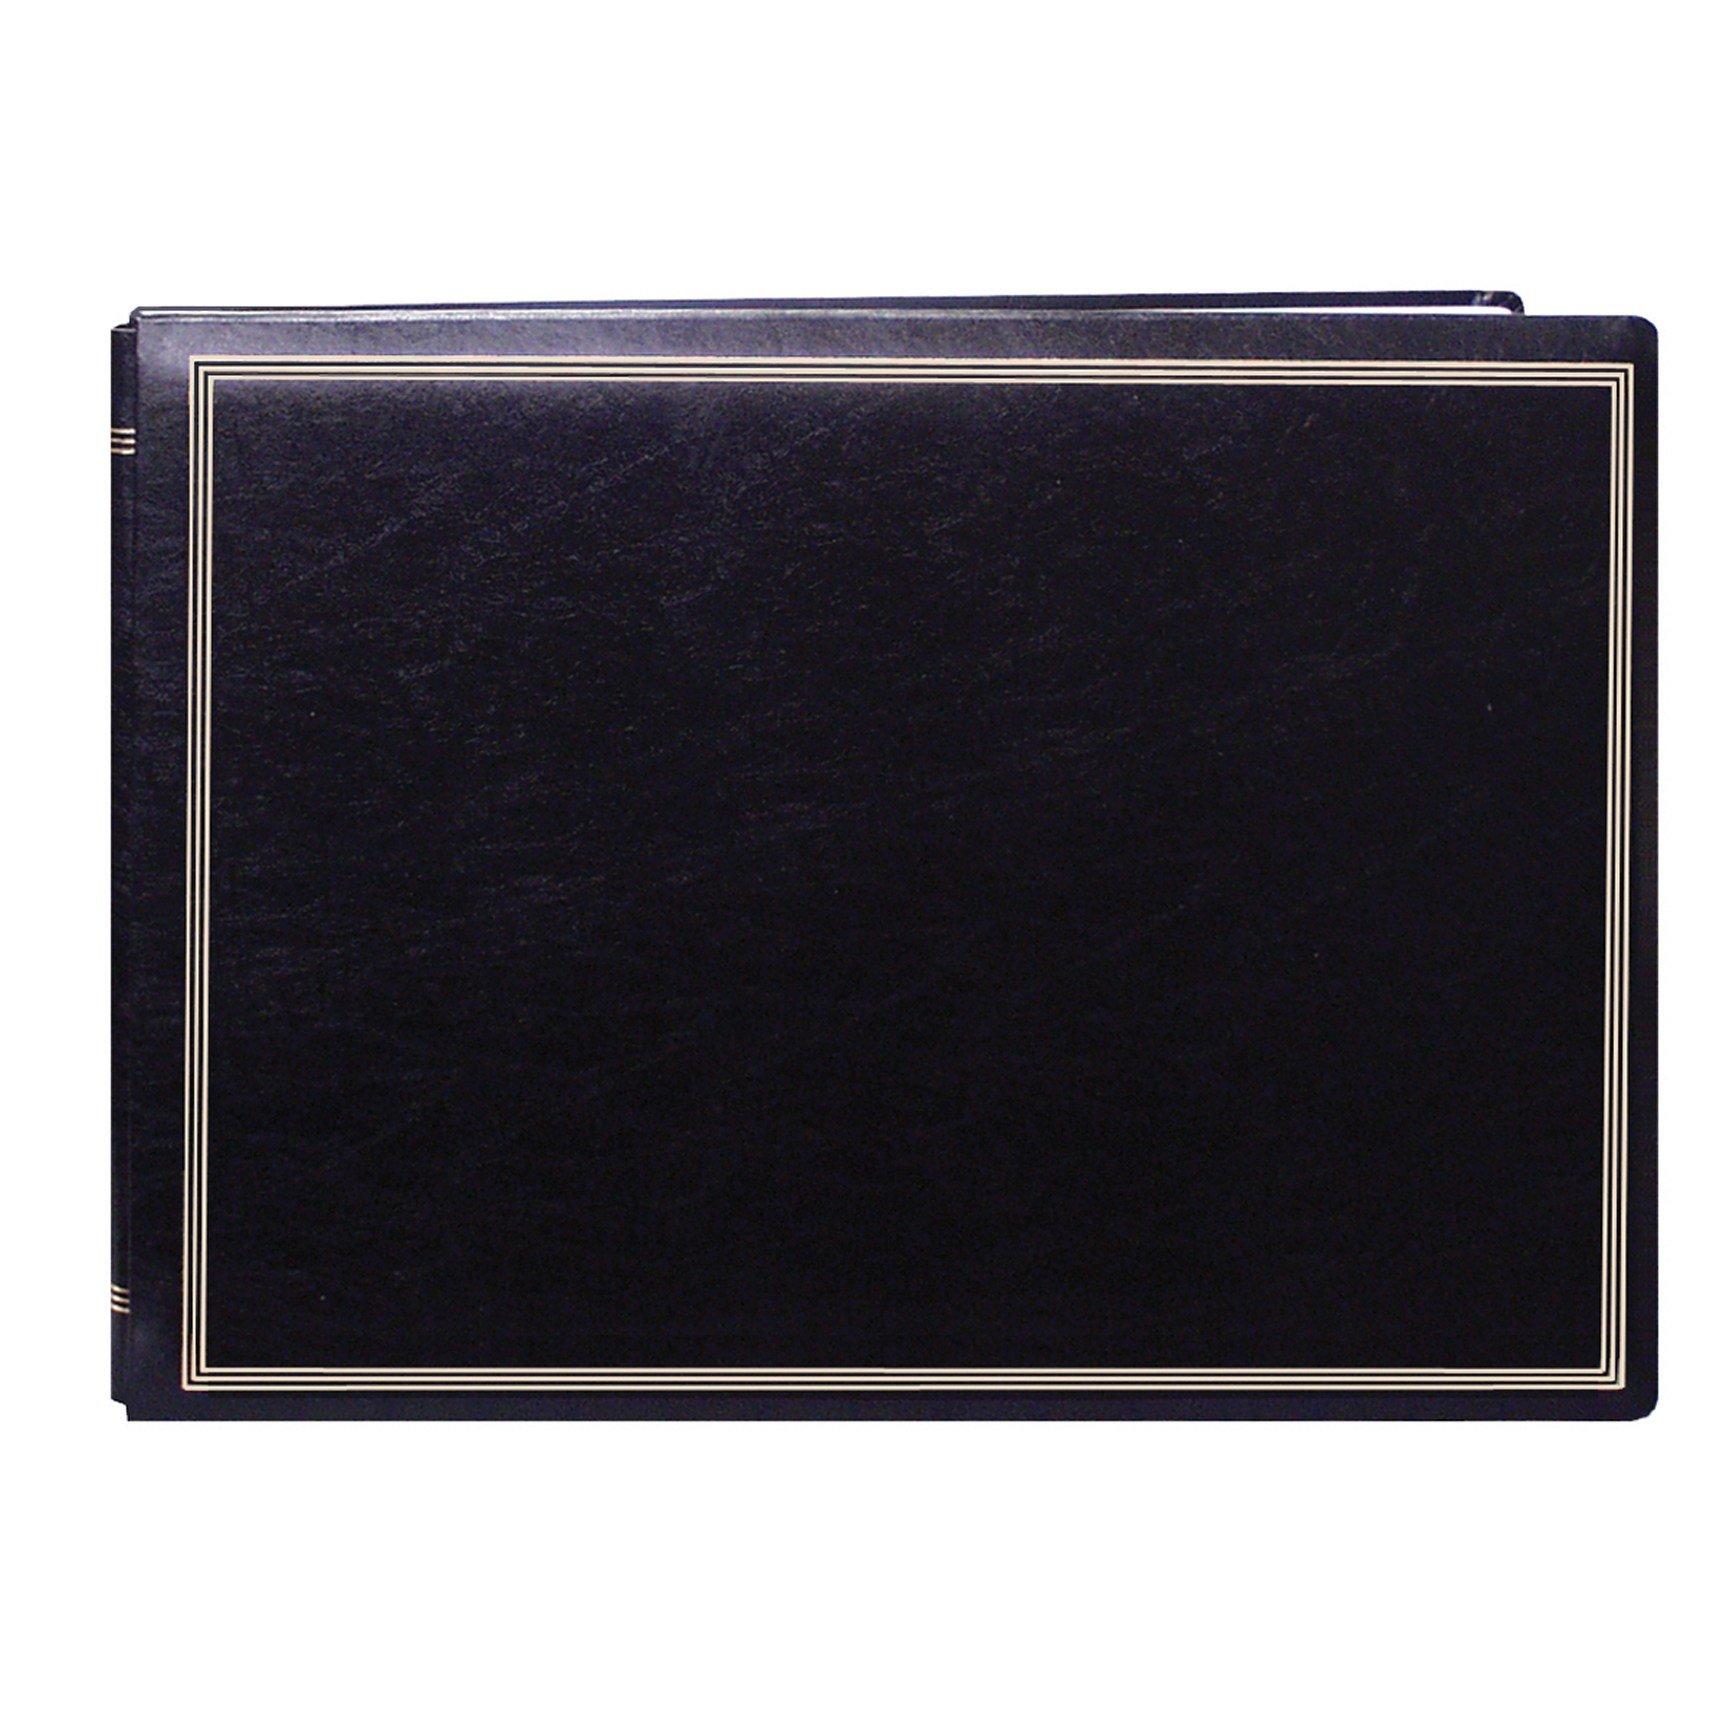 Pioneer Photo Albums Pioneer Leatherette X-Pando Magnetic Album with 2 Bonus Refill Packs by Pioneer Photo Albums (Image #1)